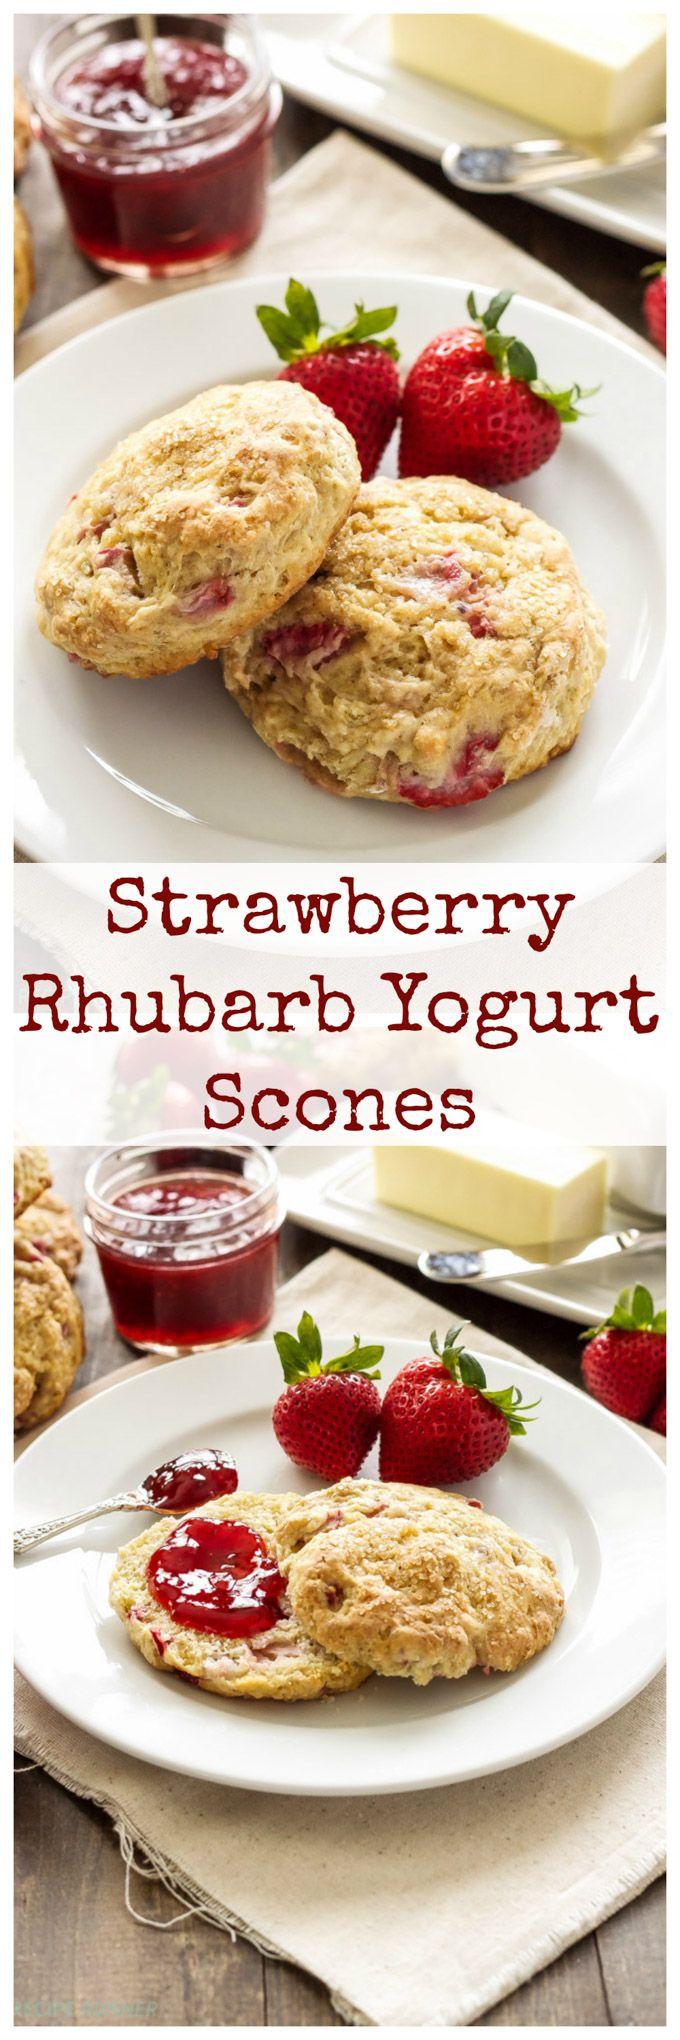 Strawberry Rhubarb Yogurt Scones | Sweet tender scones lightened up with creamy yogurt! #AussieStyle #ad